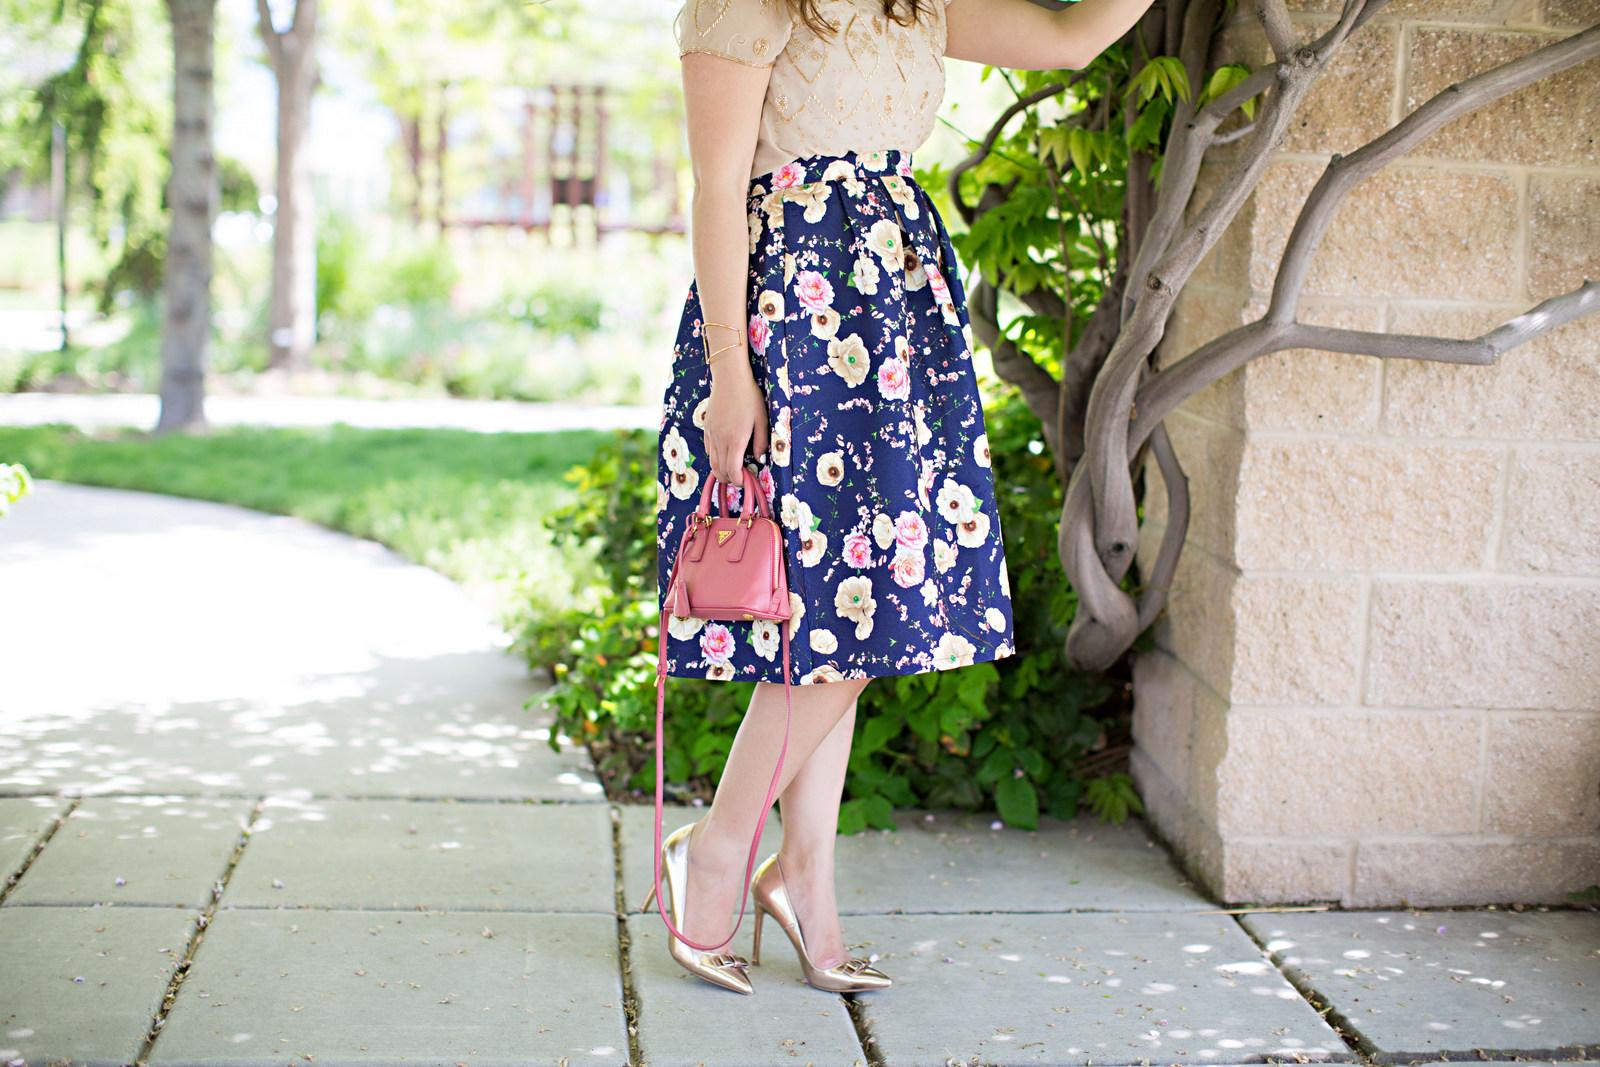 Floral skirt and Prada bag